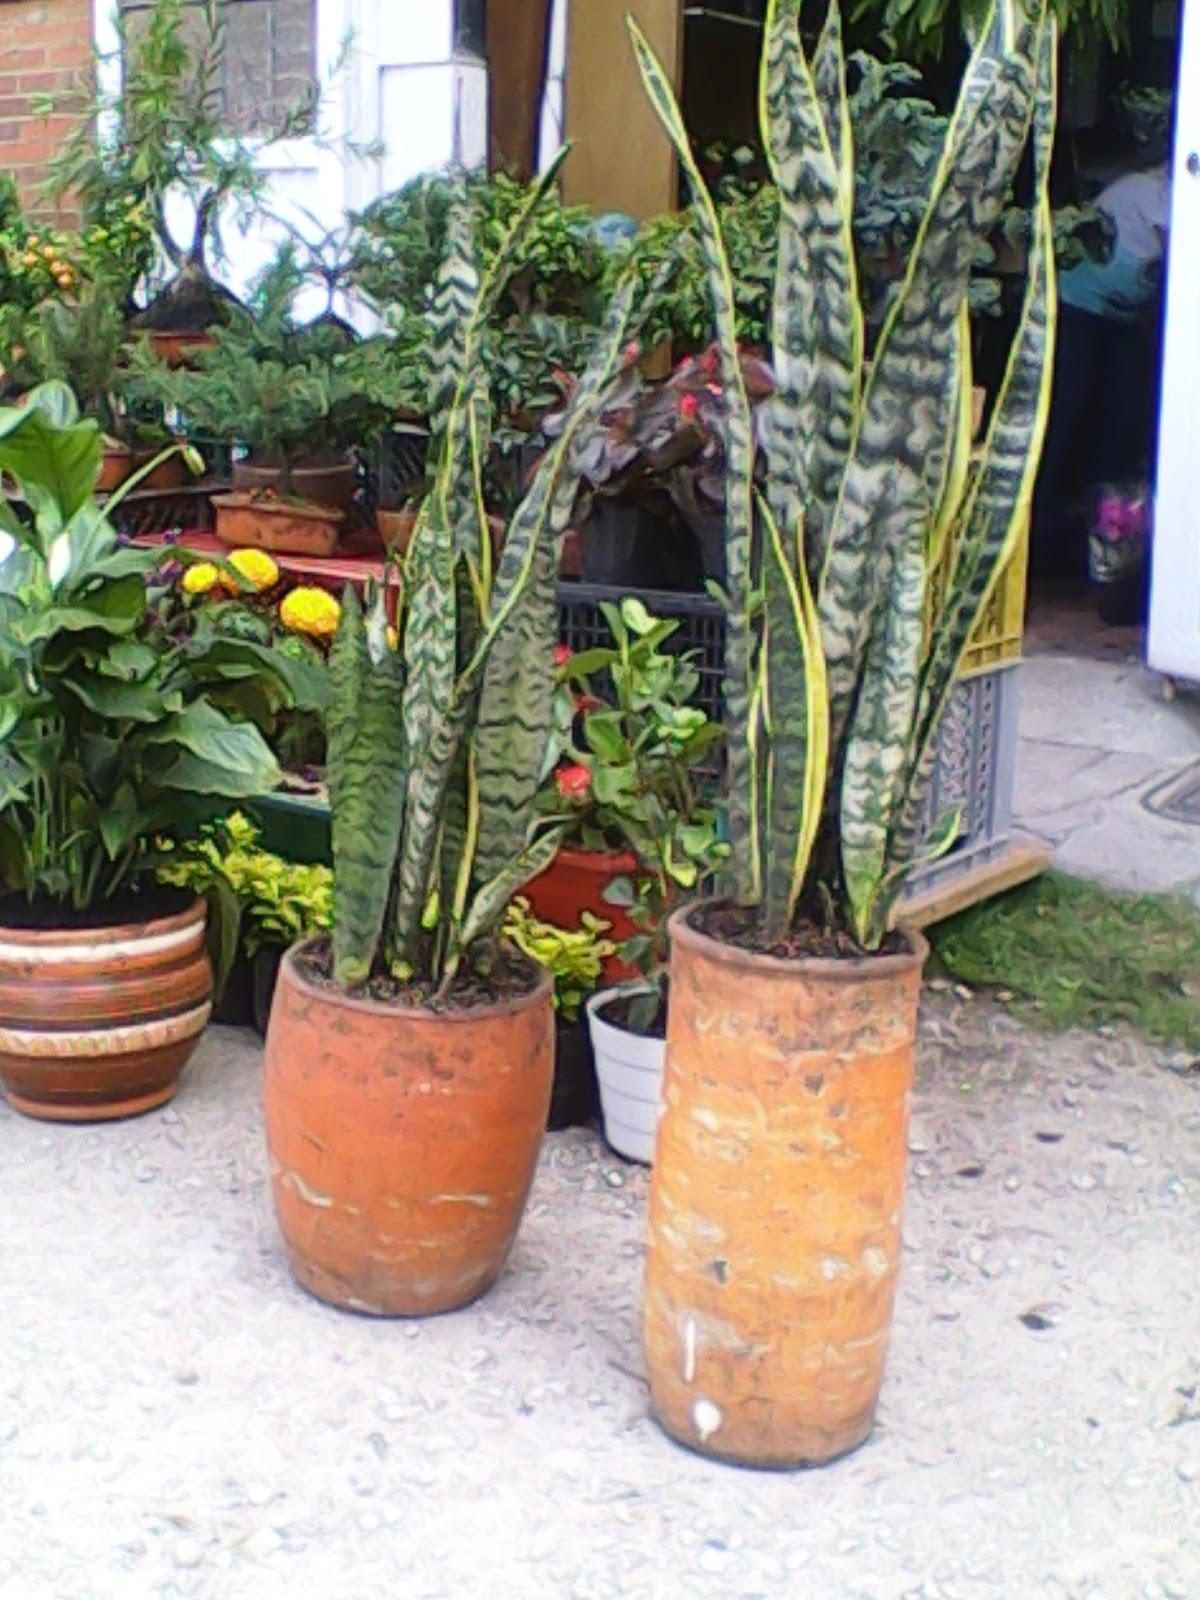 Mi xito vivero mi exito vivero plantas ornamentales for 6 plantas ornamentales